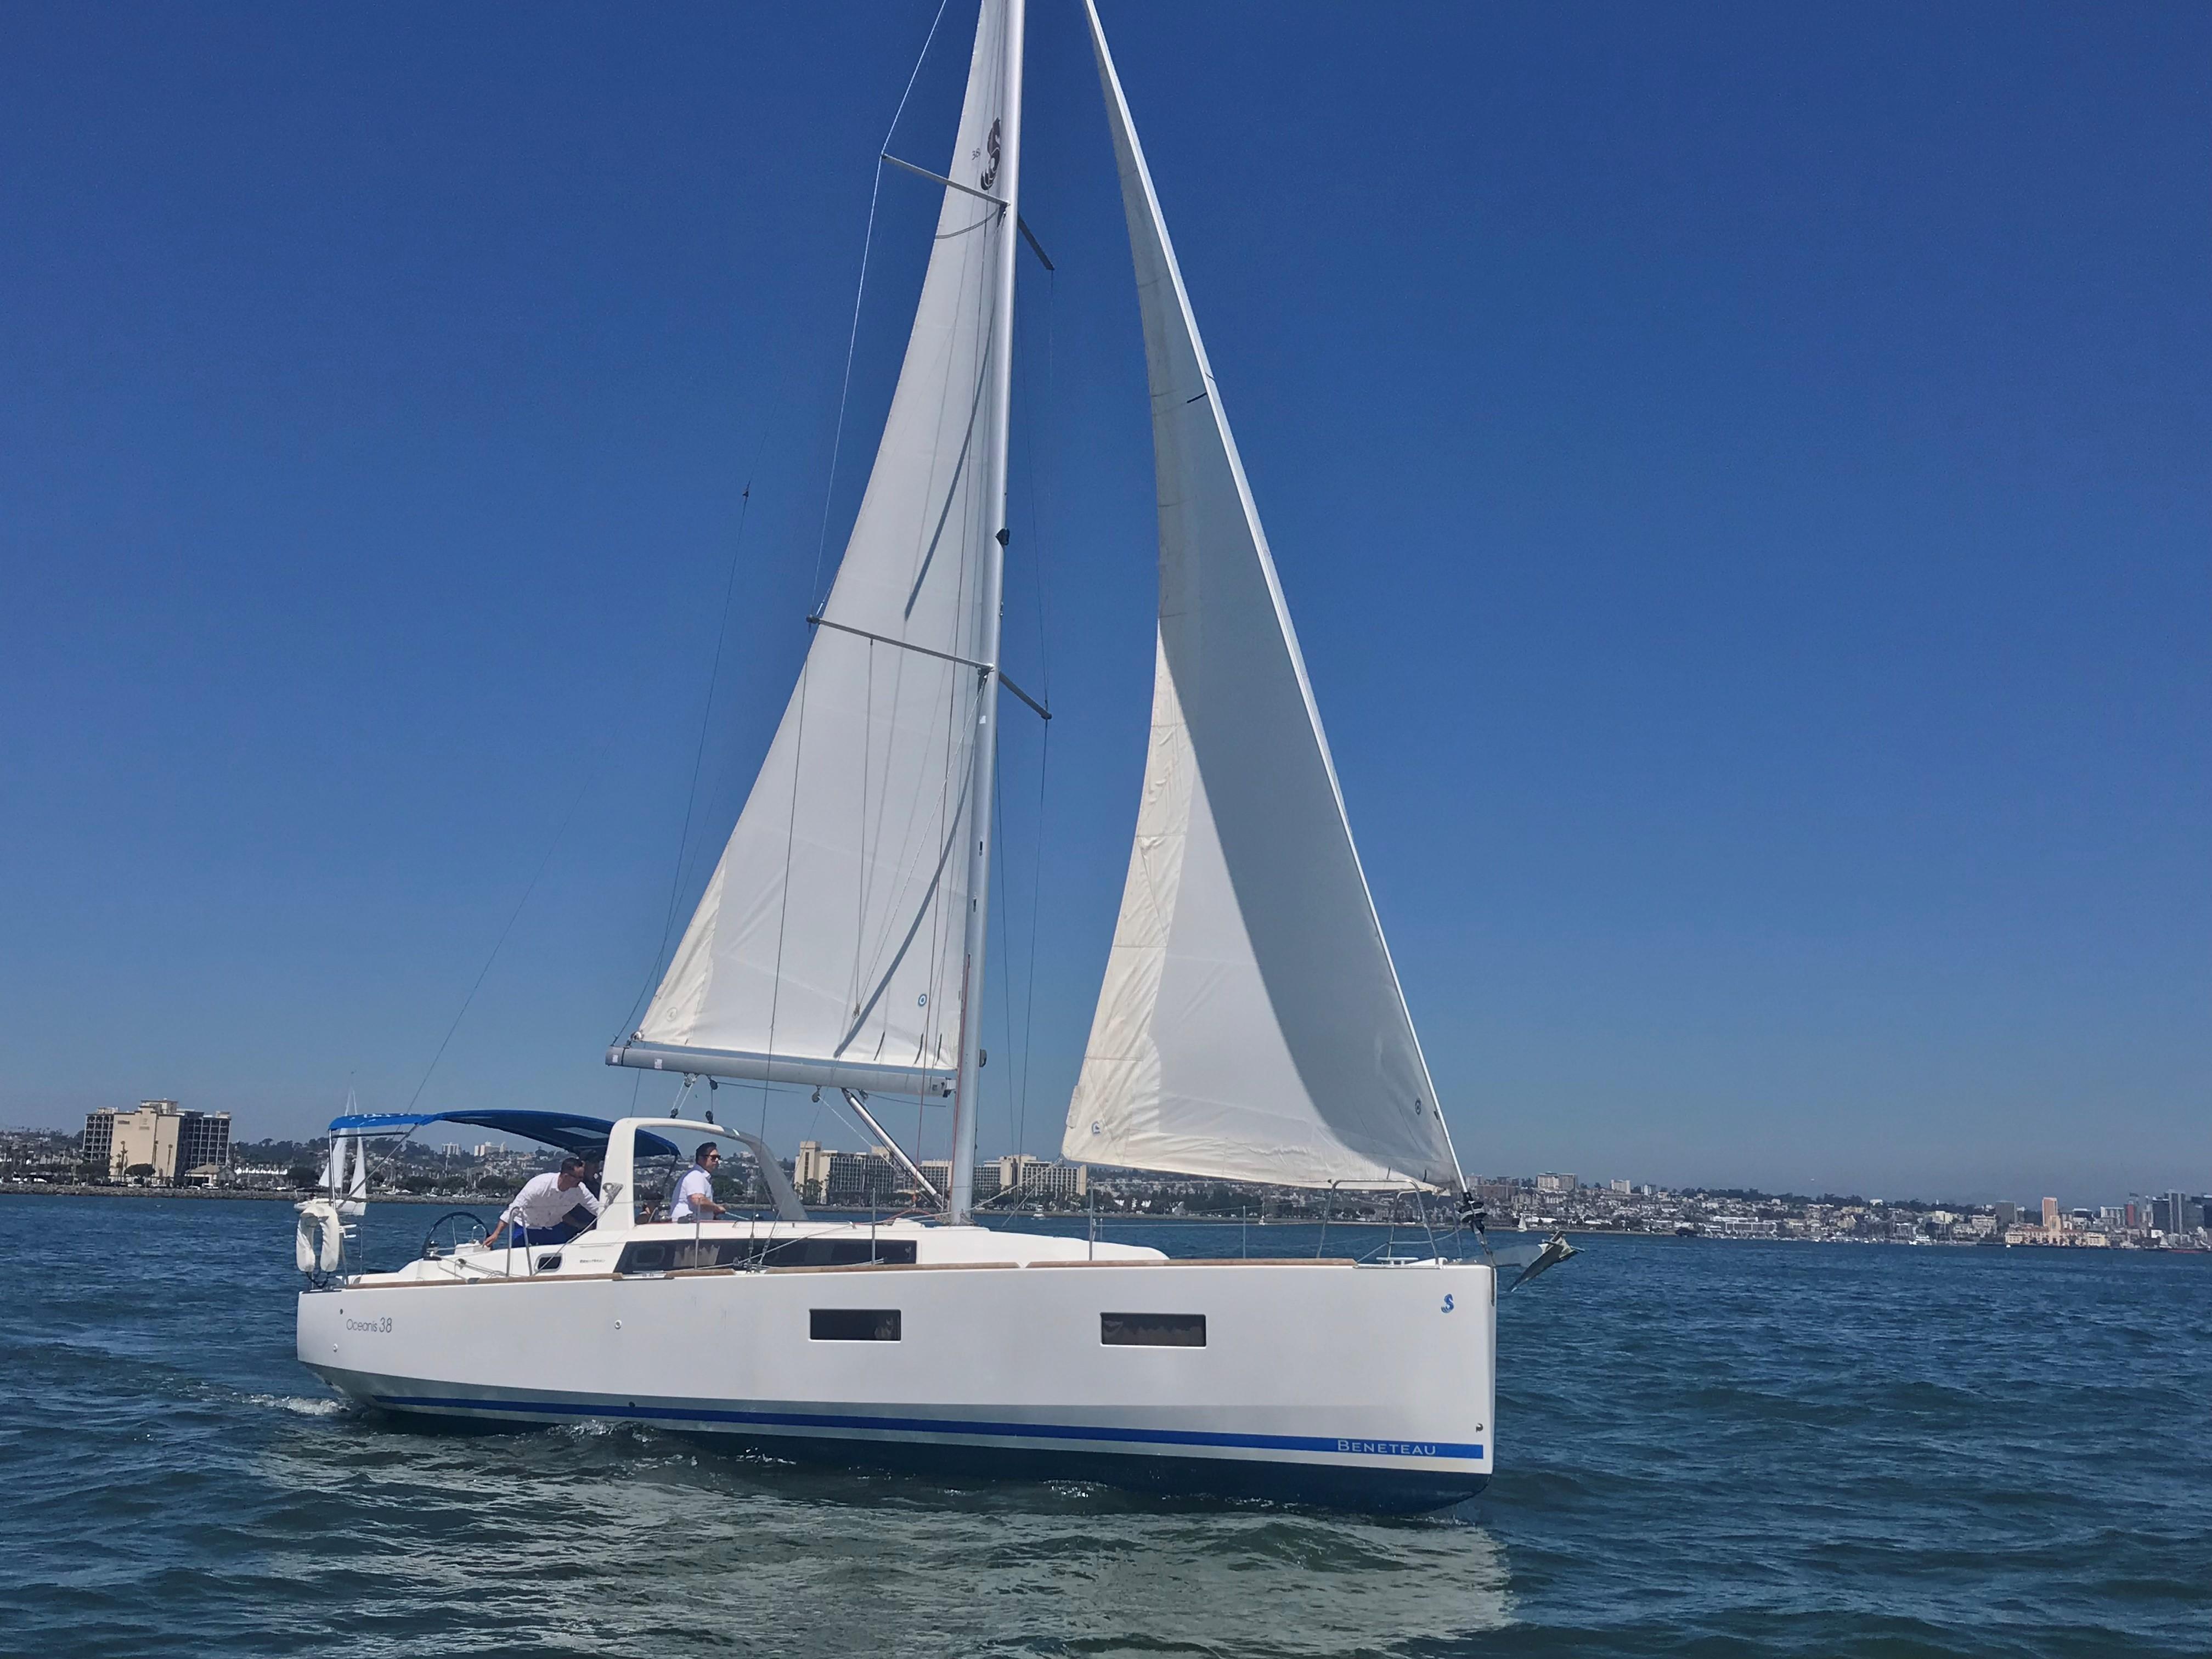 38 Beneteau Luna Mar 2014 San Diego Denison Yacht Sales